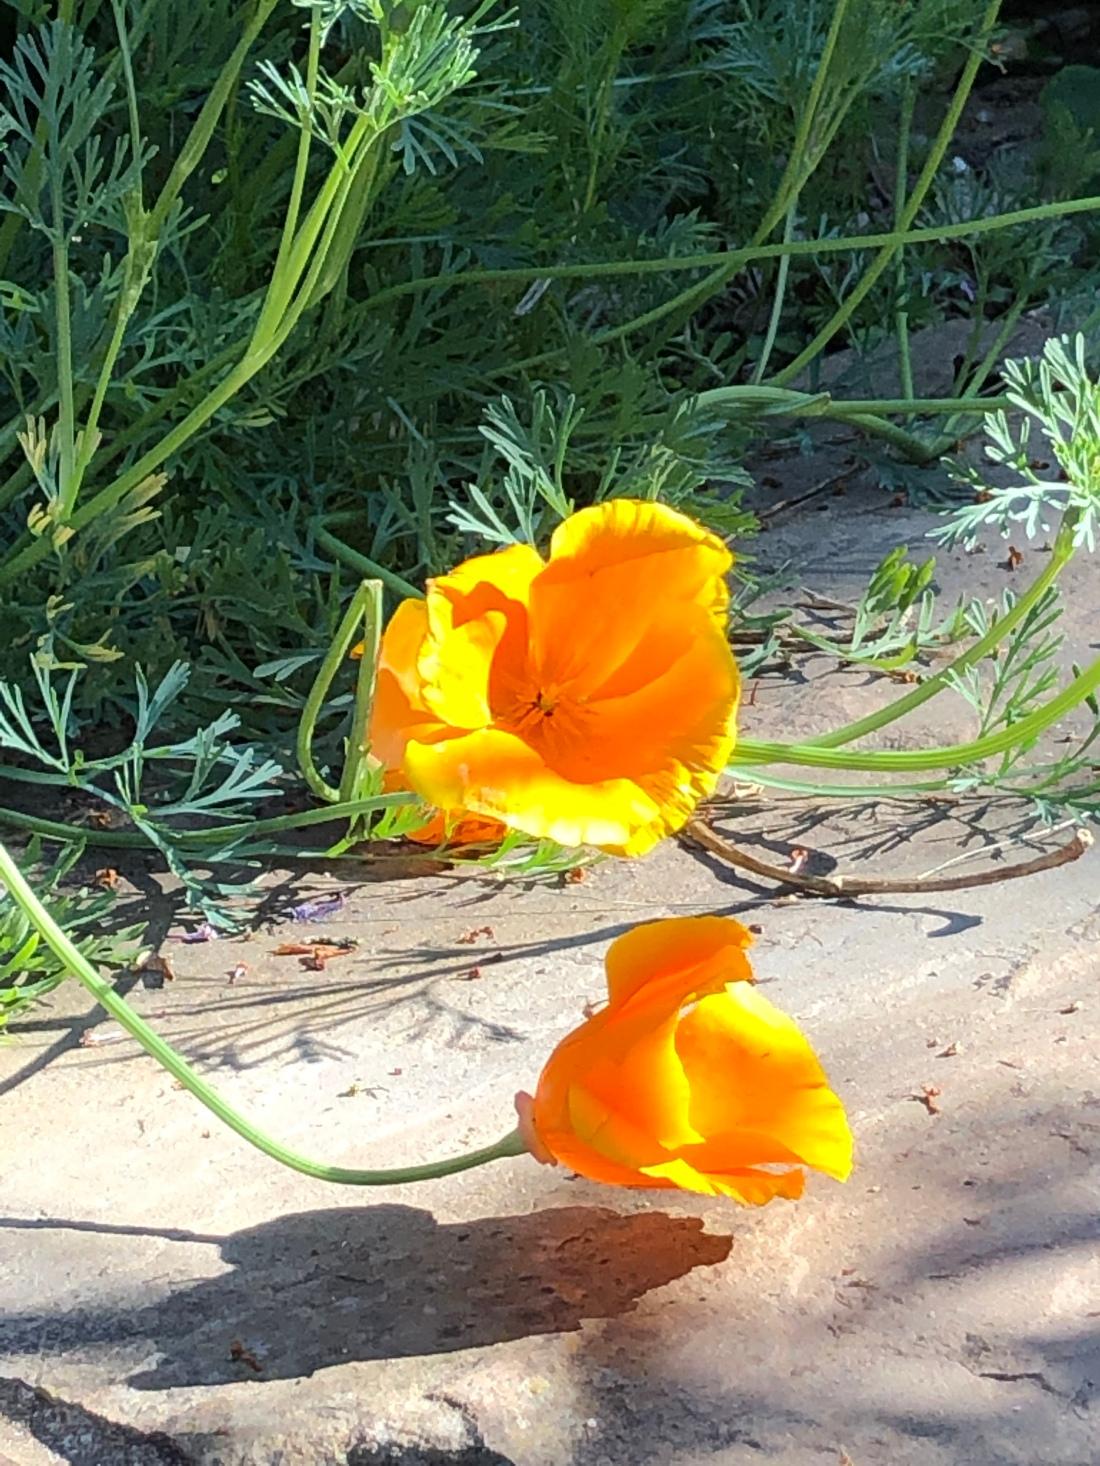 California poppies in the sunshine